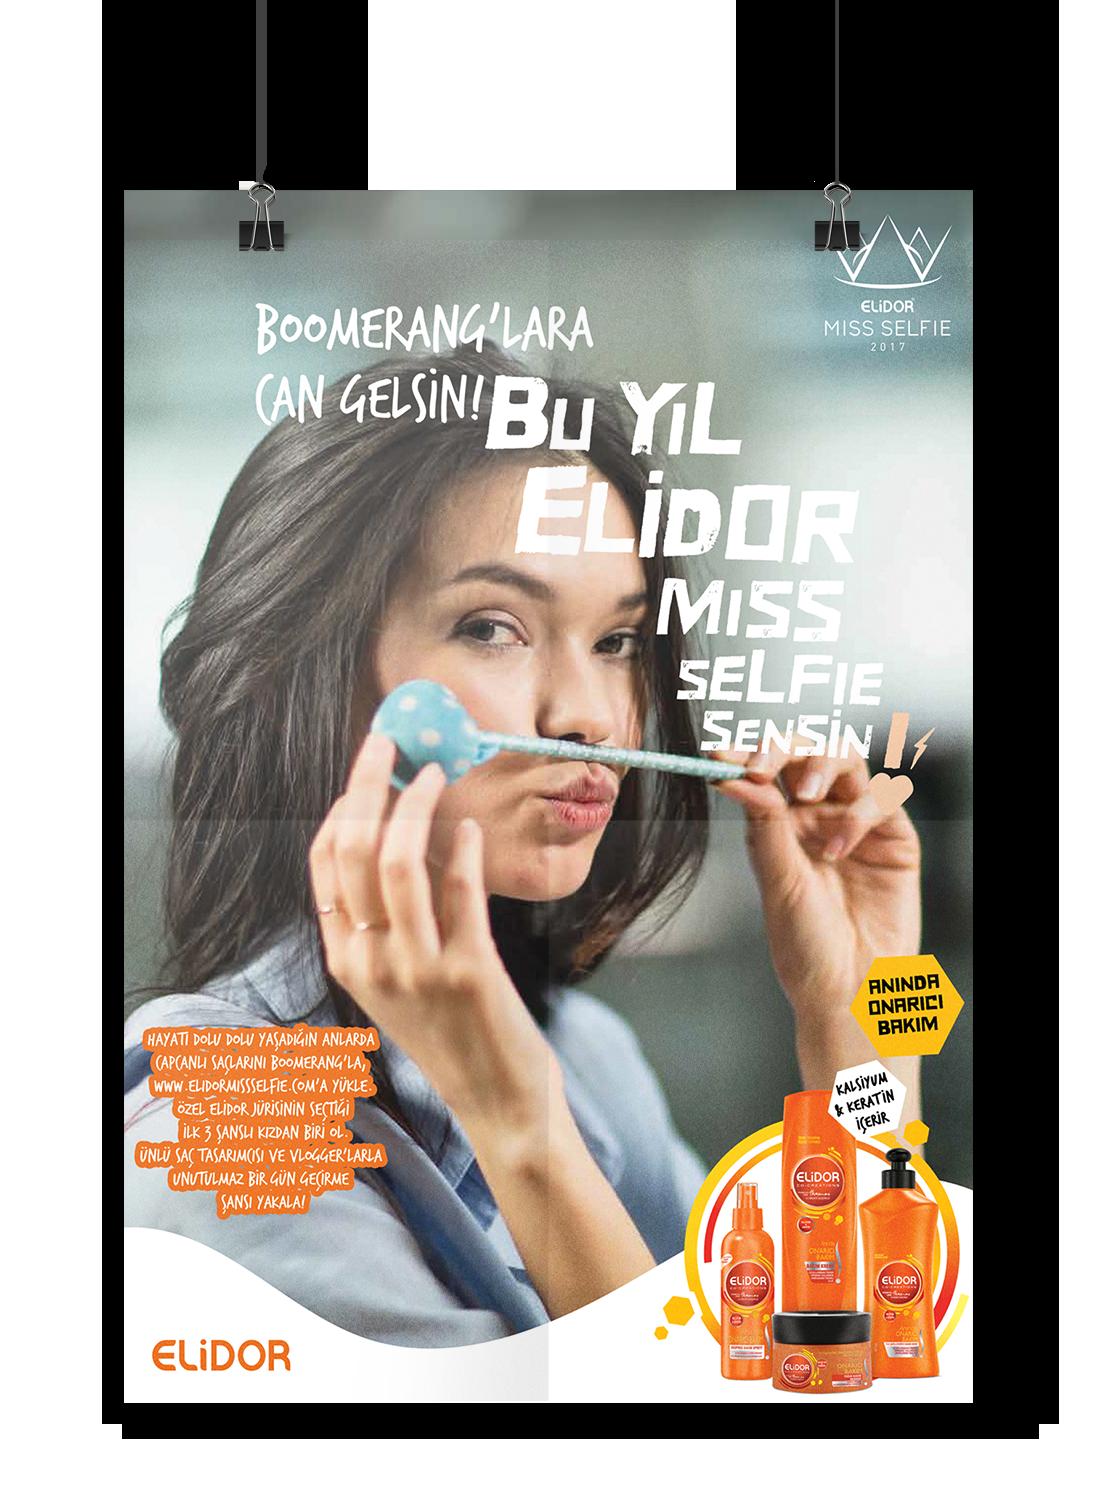 Website elidor Unilever miss selfie instagram Boomerang Competition hair cosmetics beauty pageant